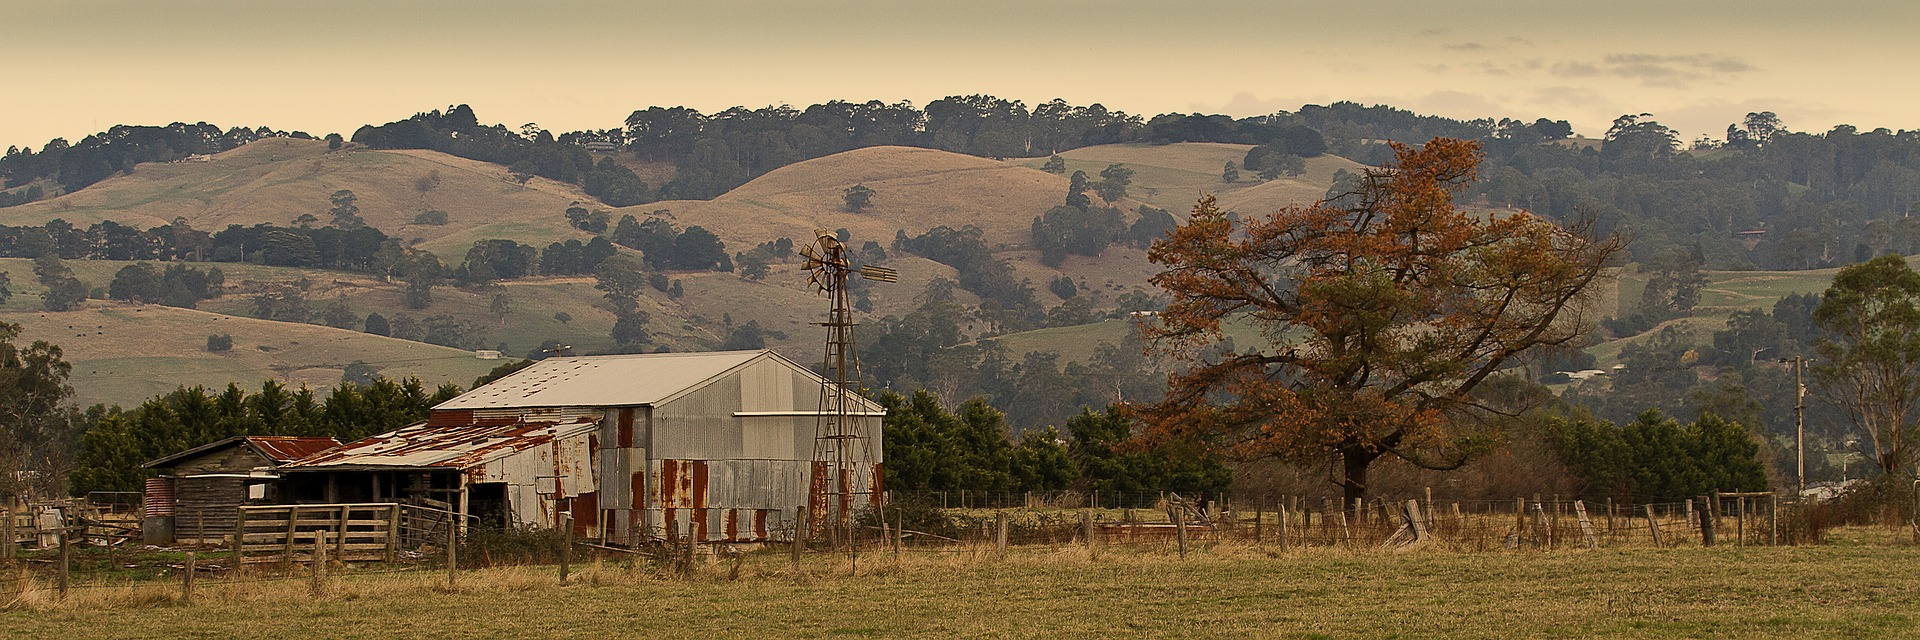 rustic farm 918105 1920